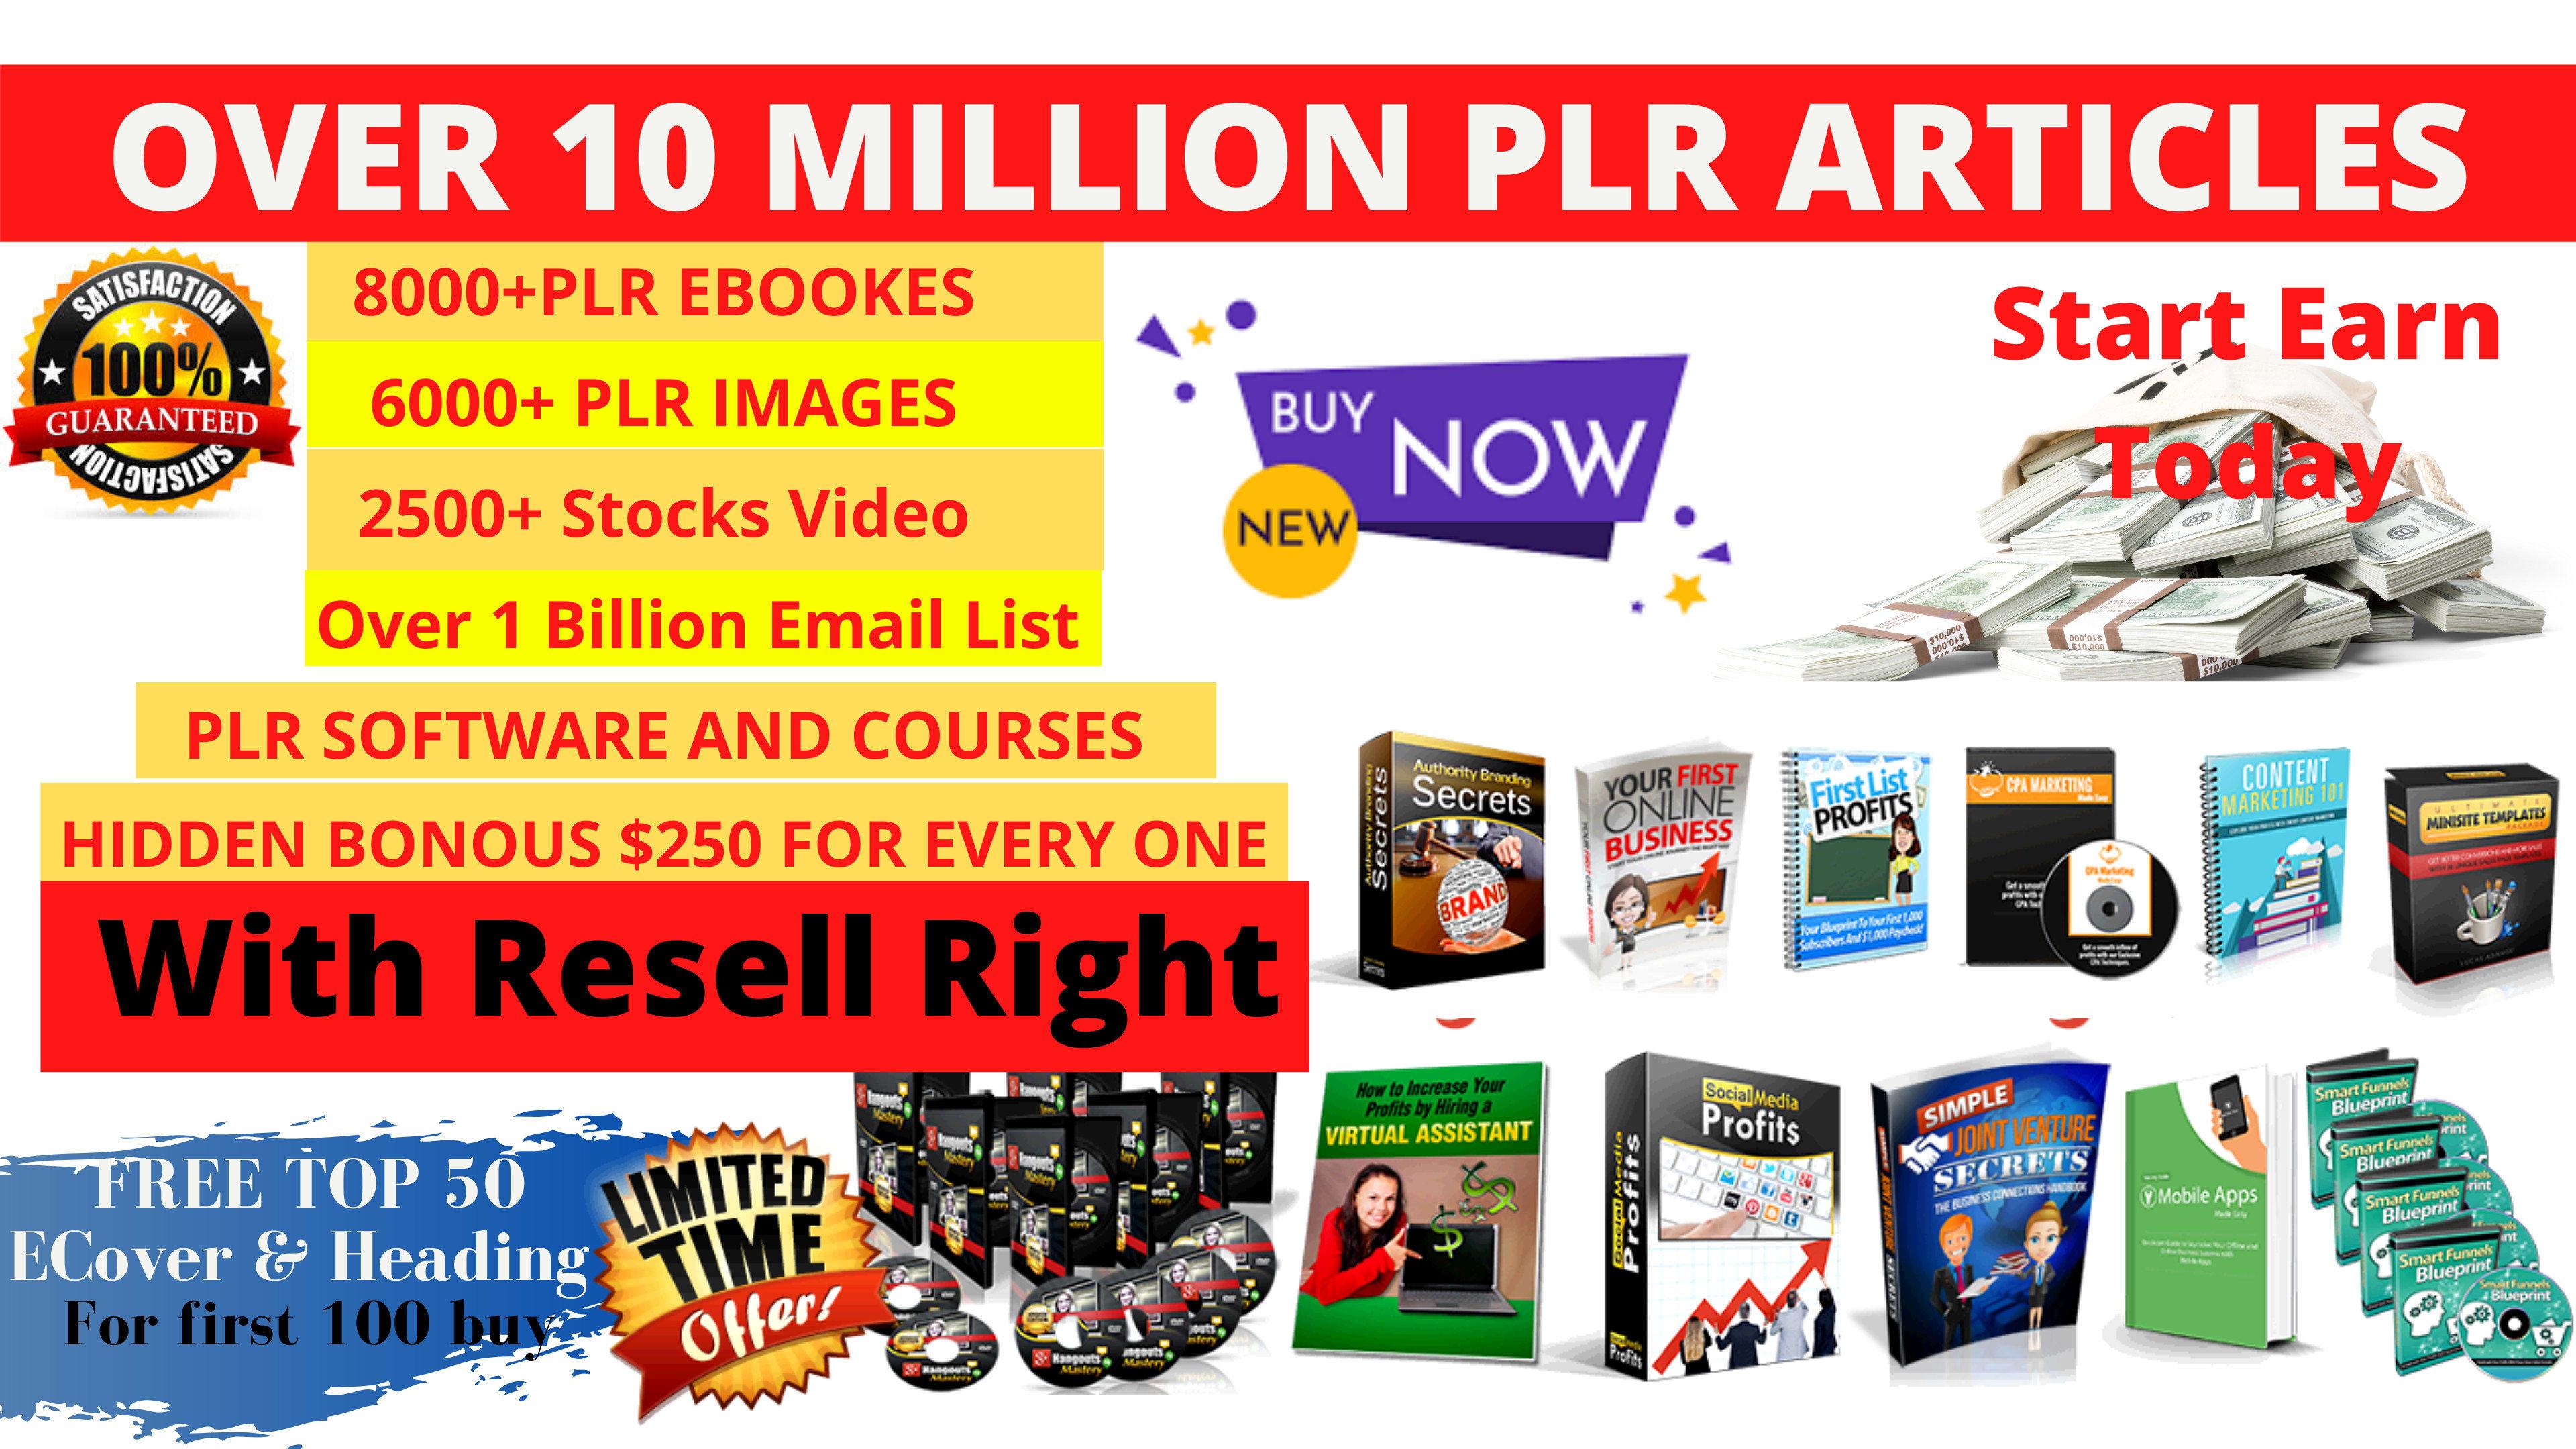 I will send 10 million plr articles,  ebooks,  software,  video training